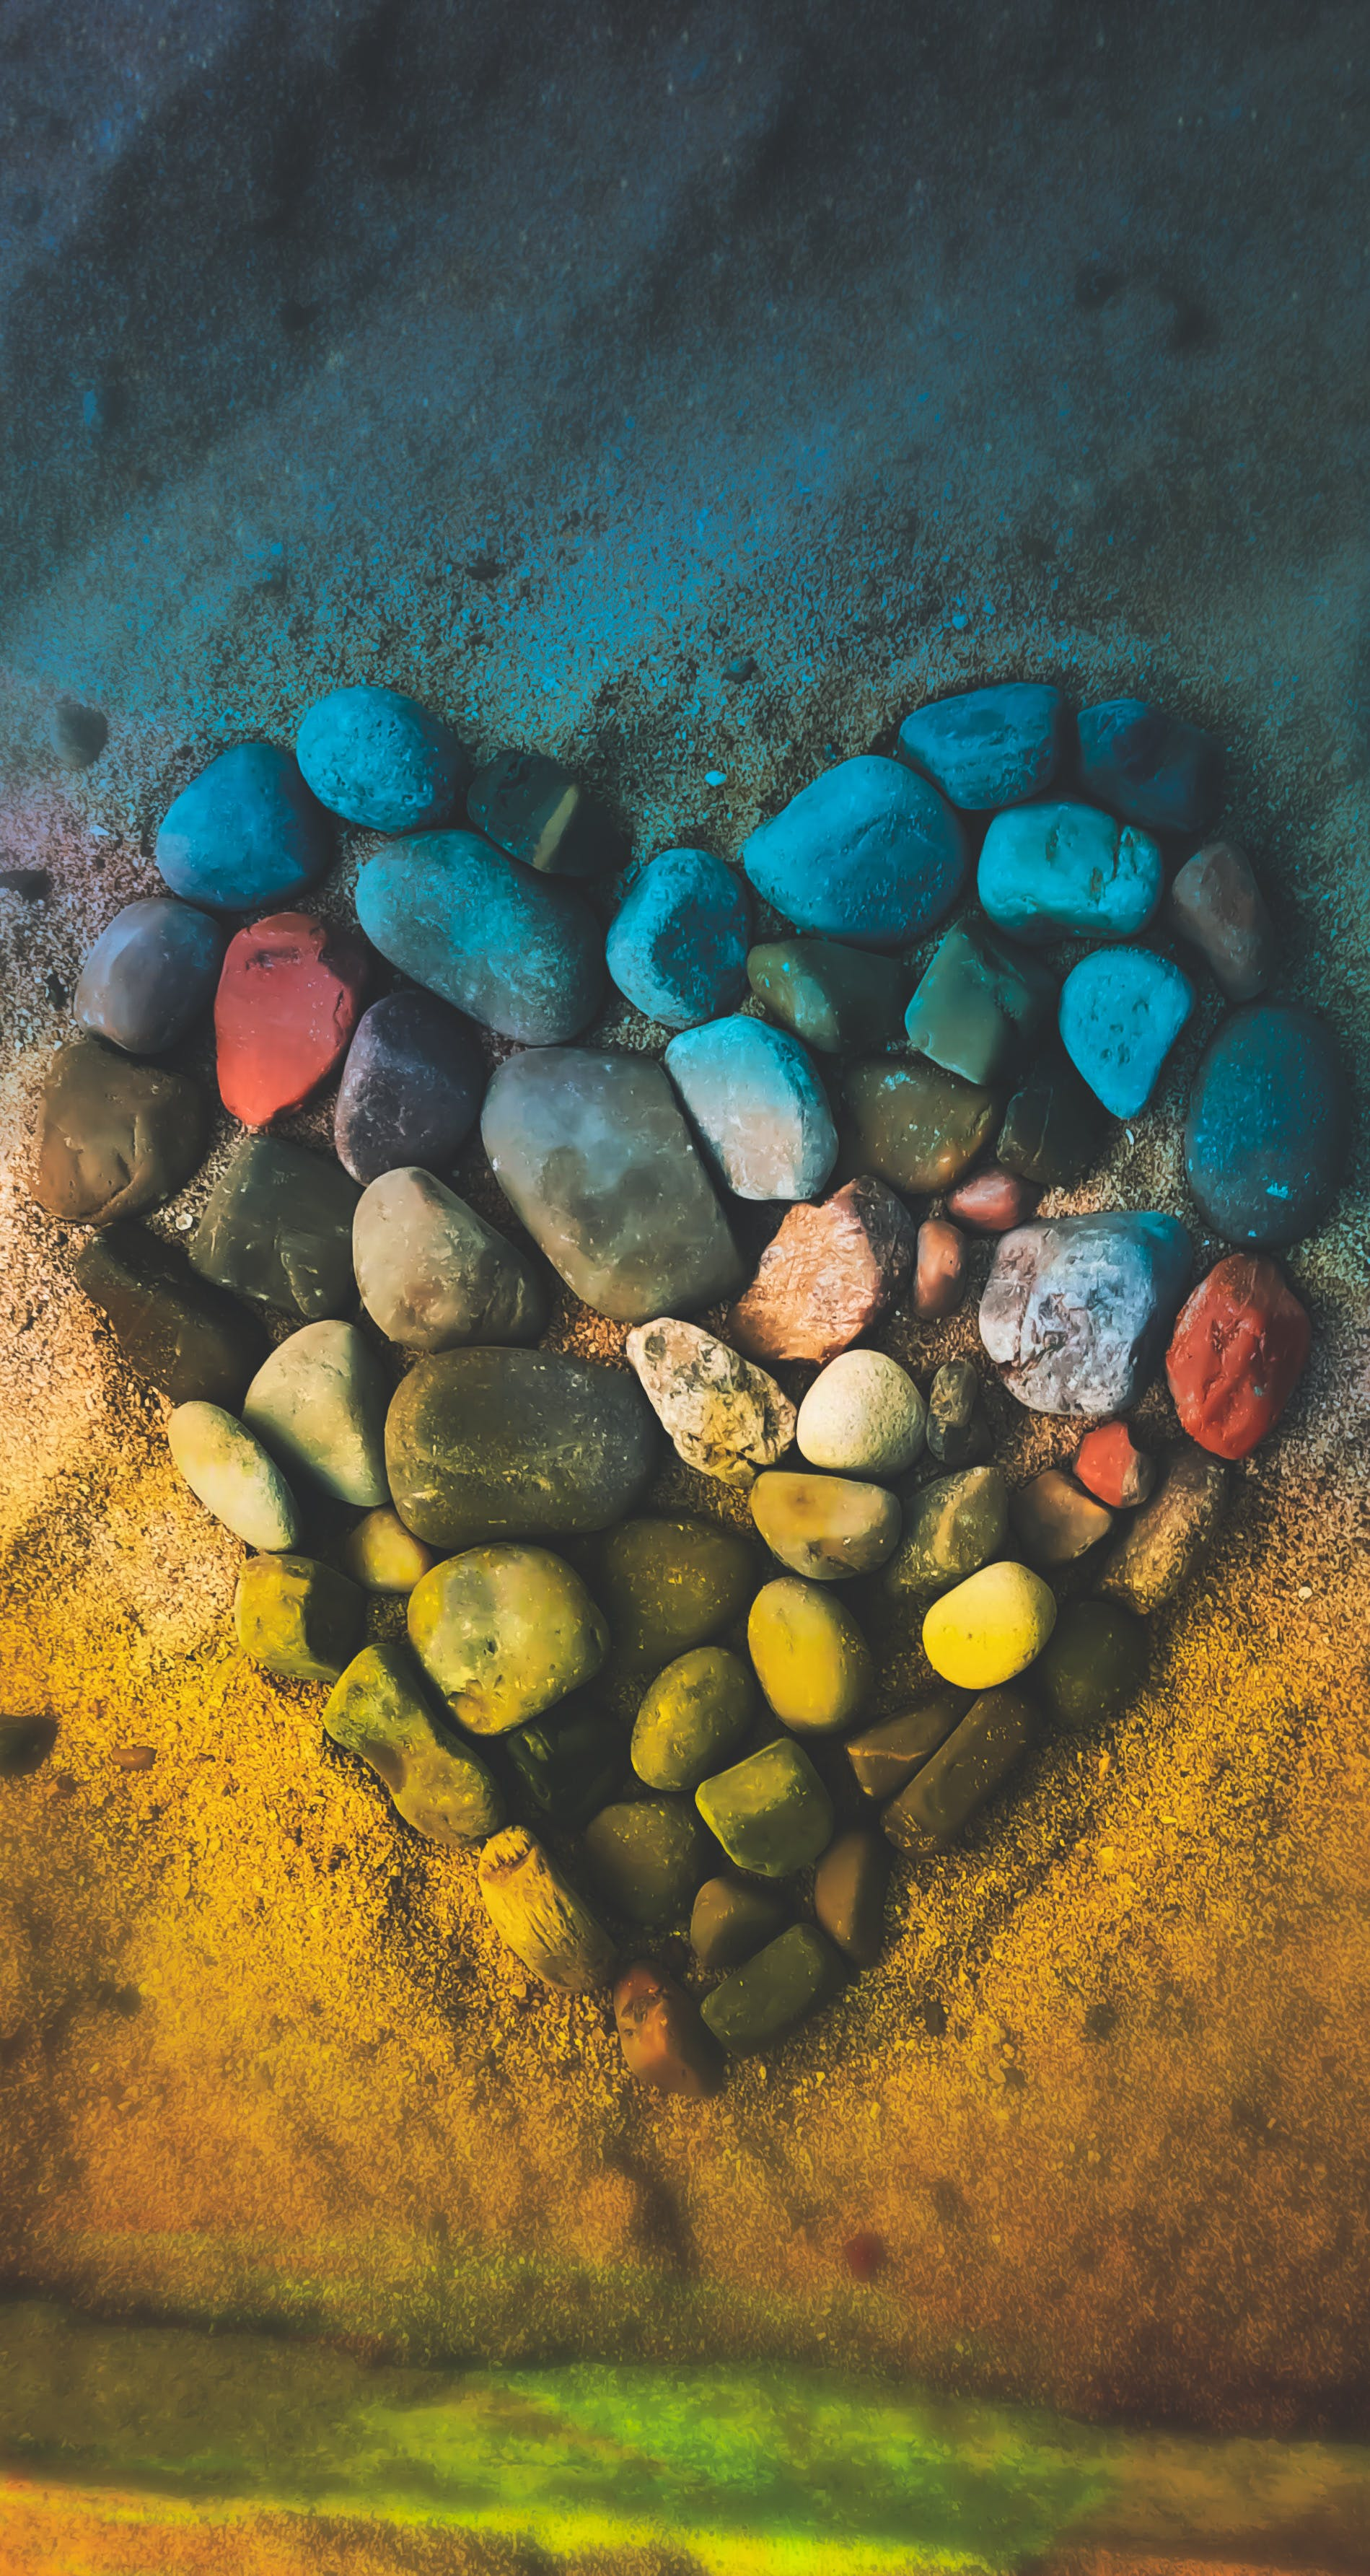 Free stock photo of cobblestone, gemstone, HD wallpaper, heart